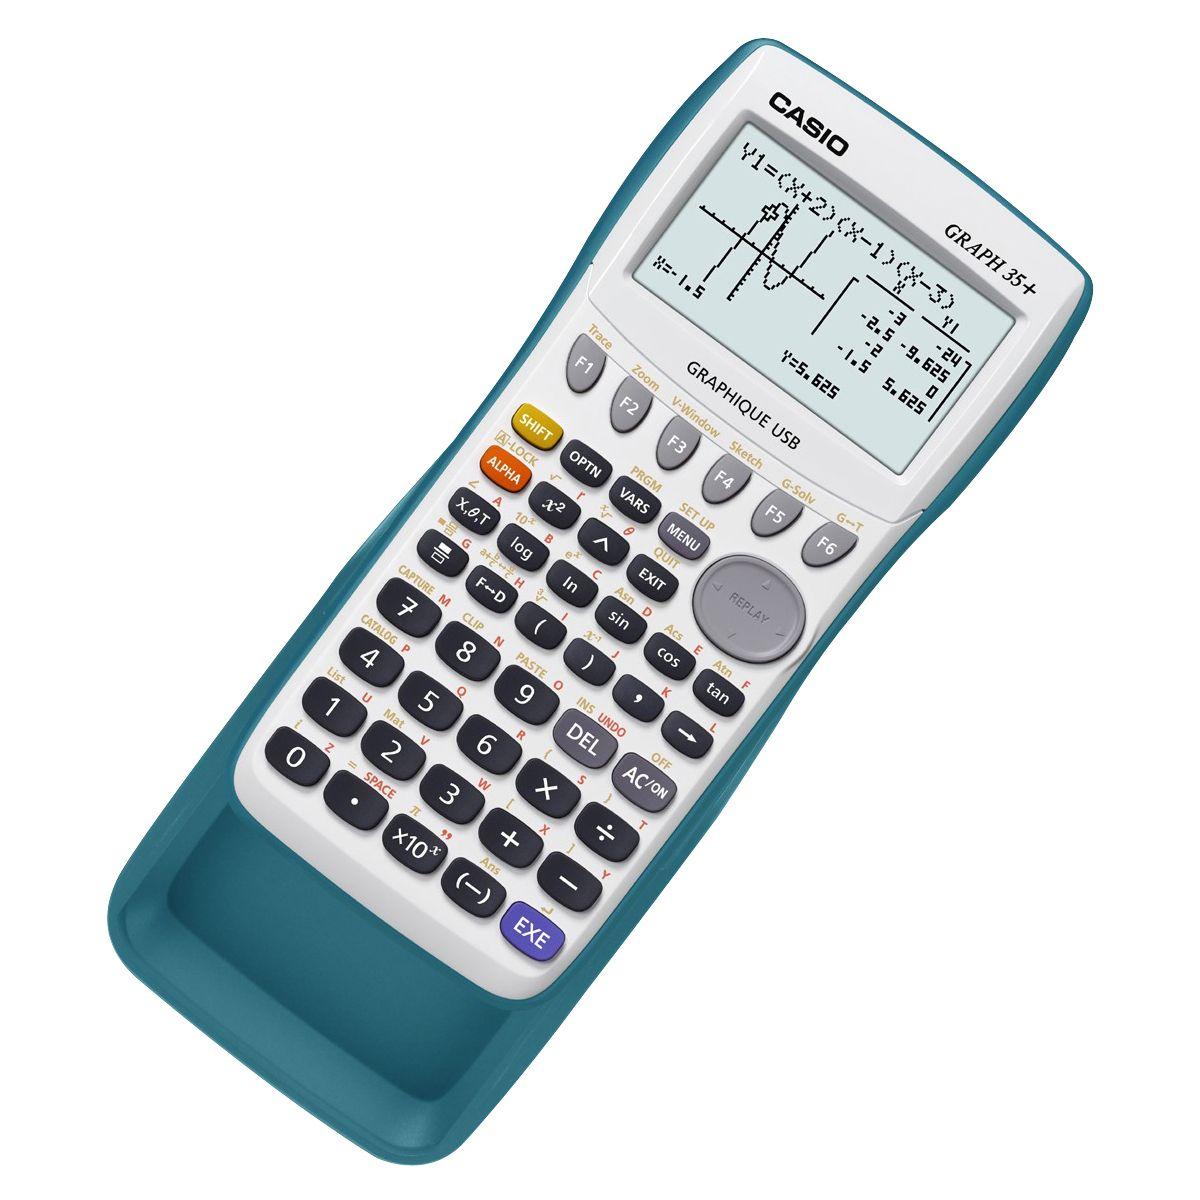 Calculatrice graphique casio graph 35+ e - livraison offerte : code liv (photo)